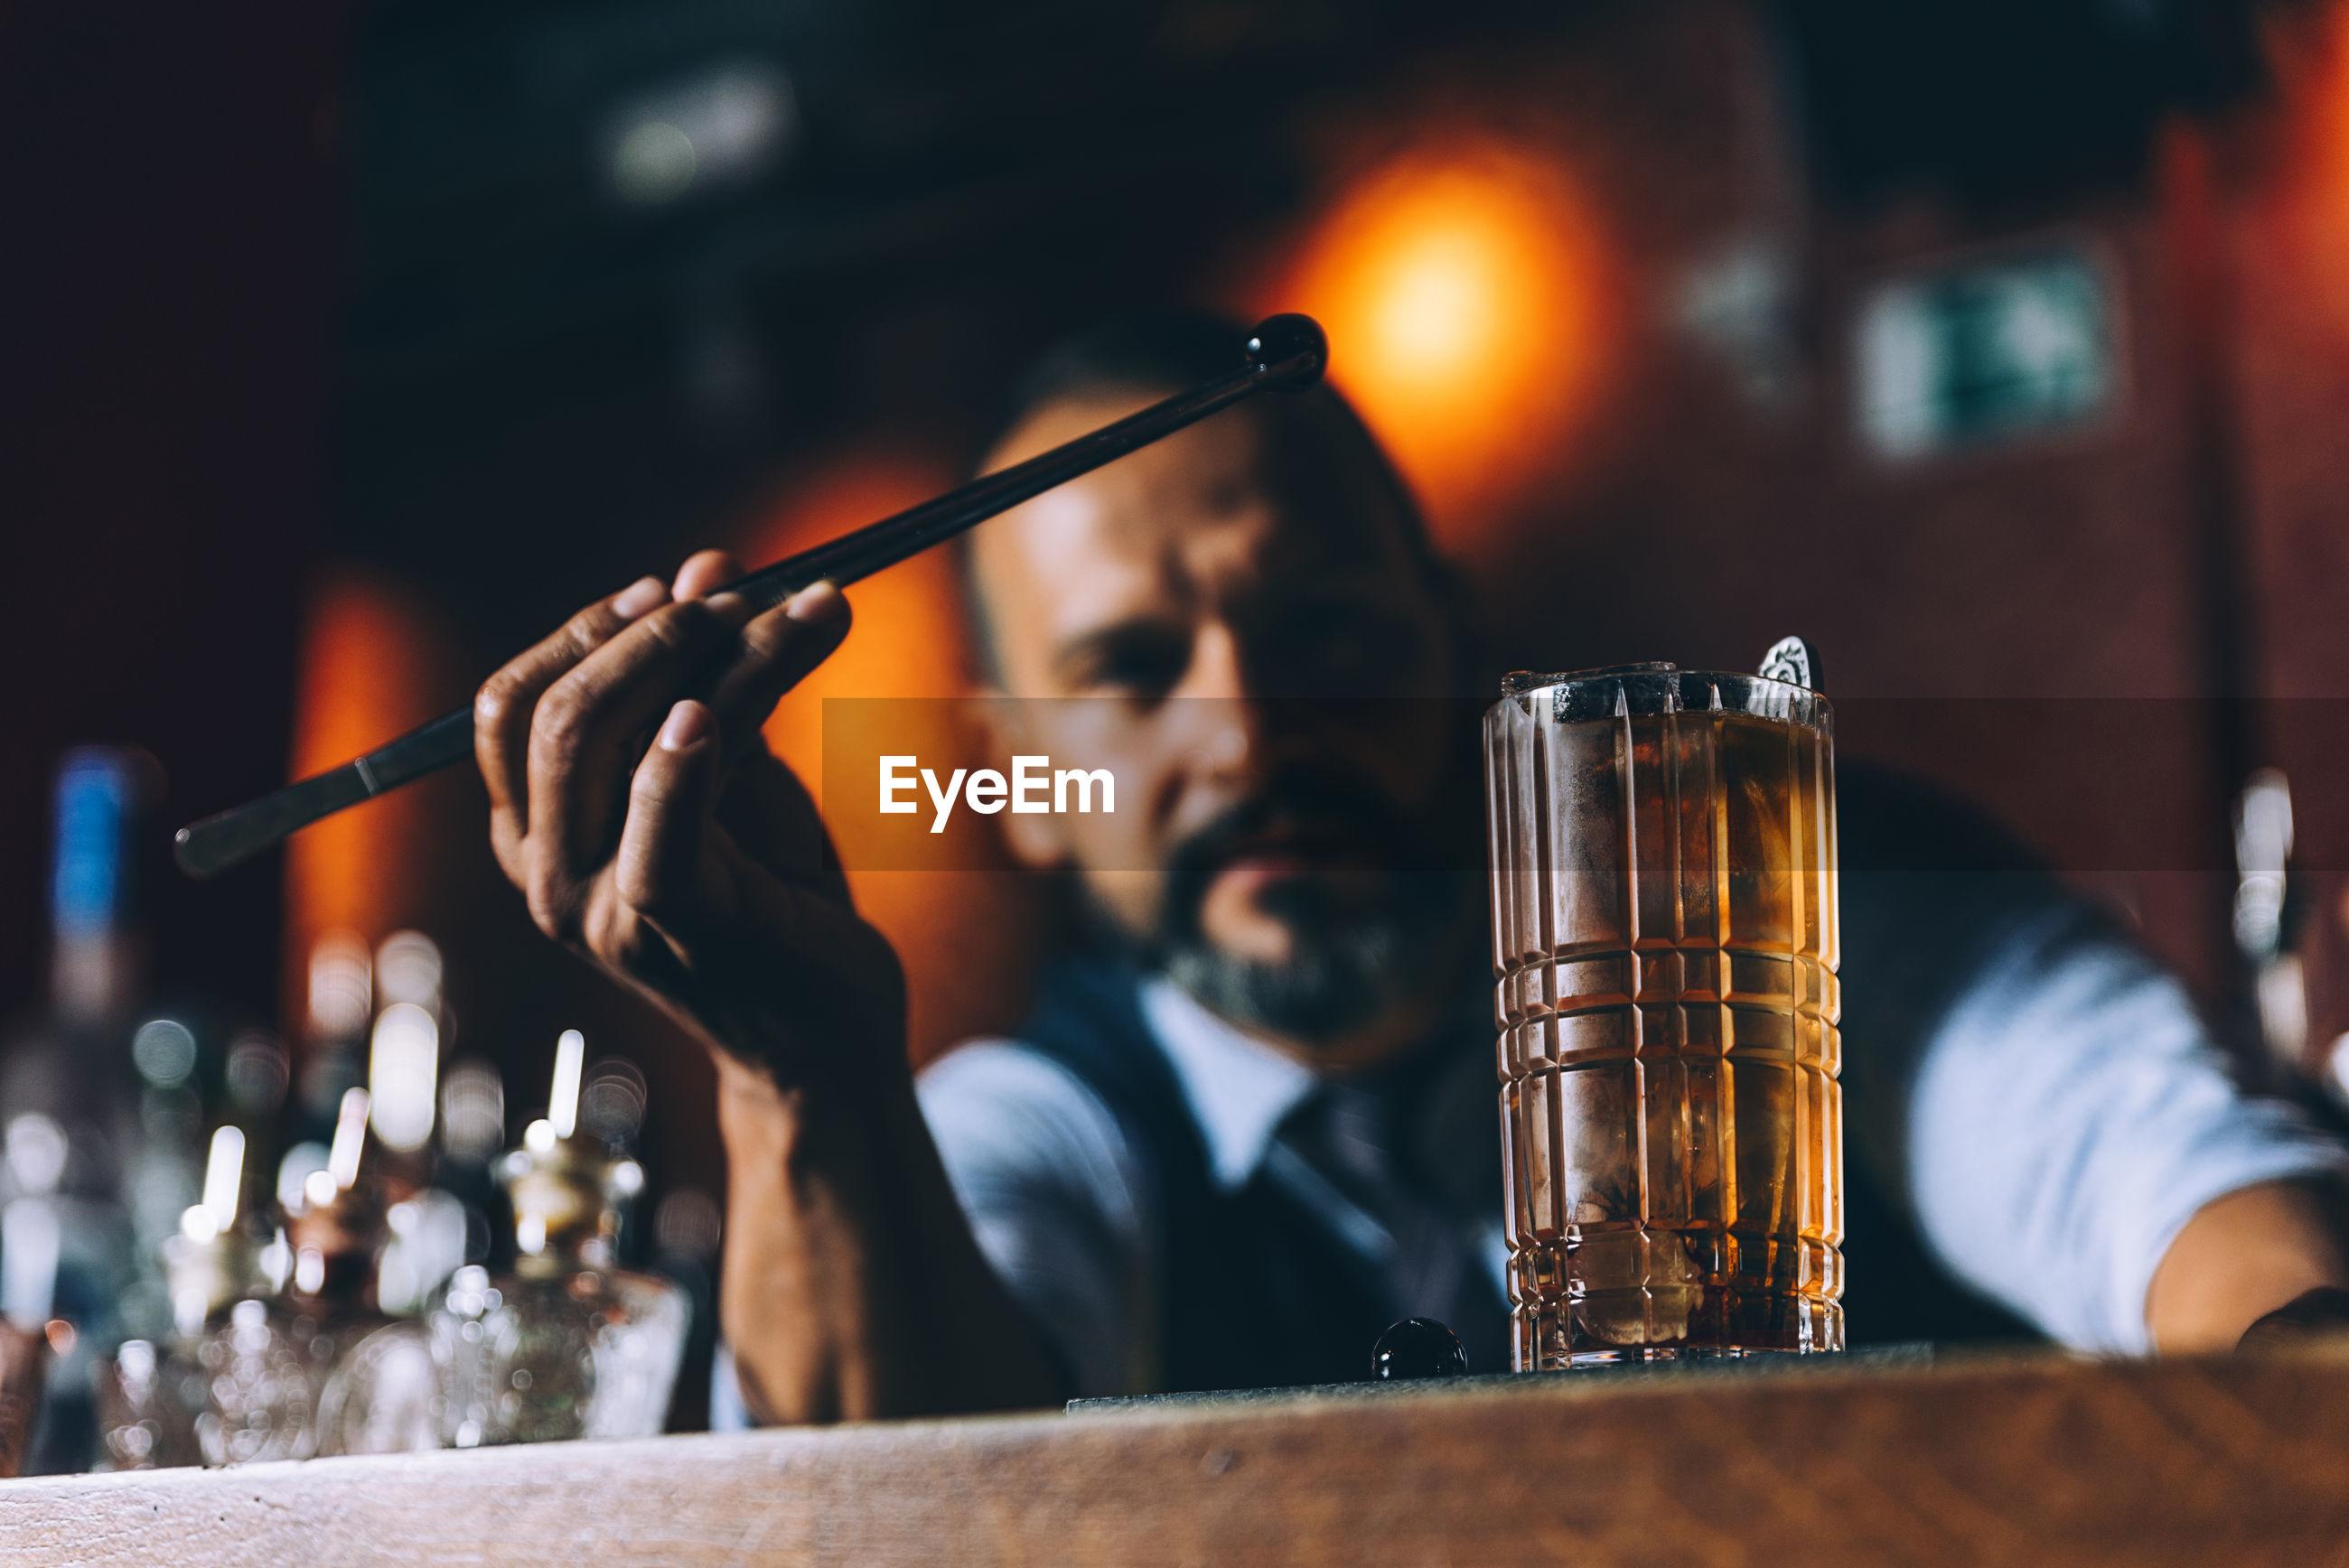 Bartender making drink at counter